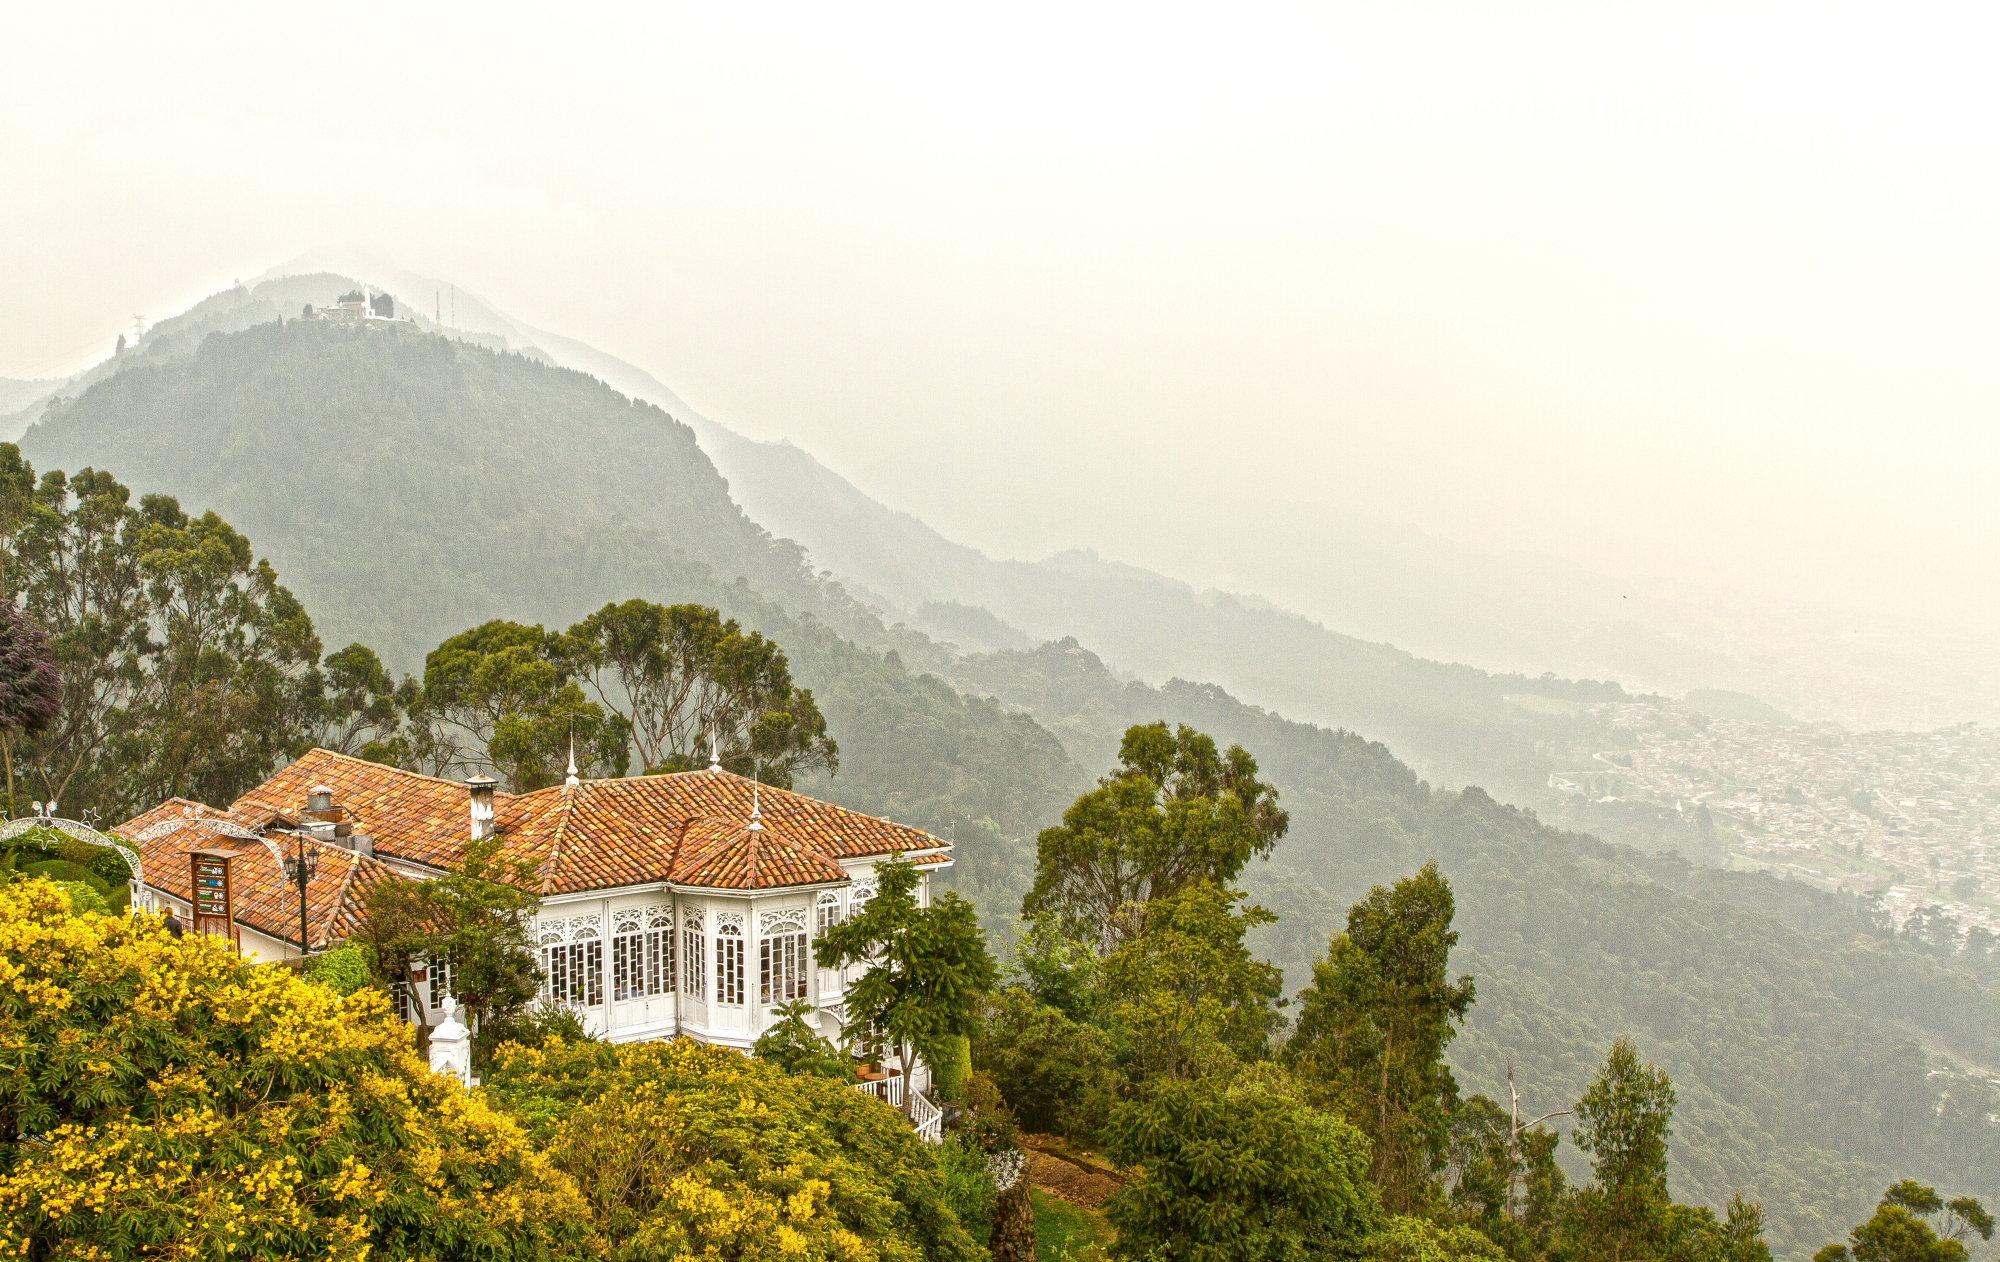 Casa San Isidro restaurant on top of Montserrate Mountain, Bogota Colombia.